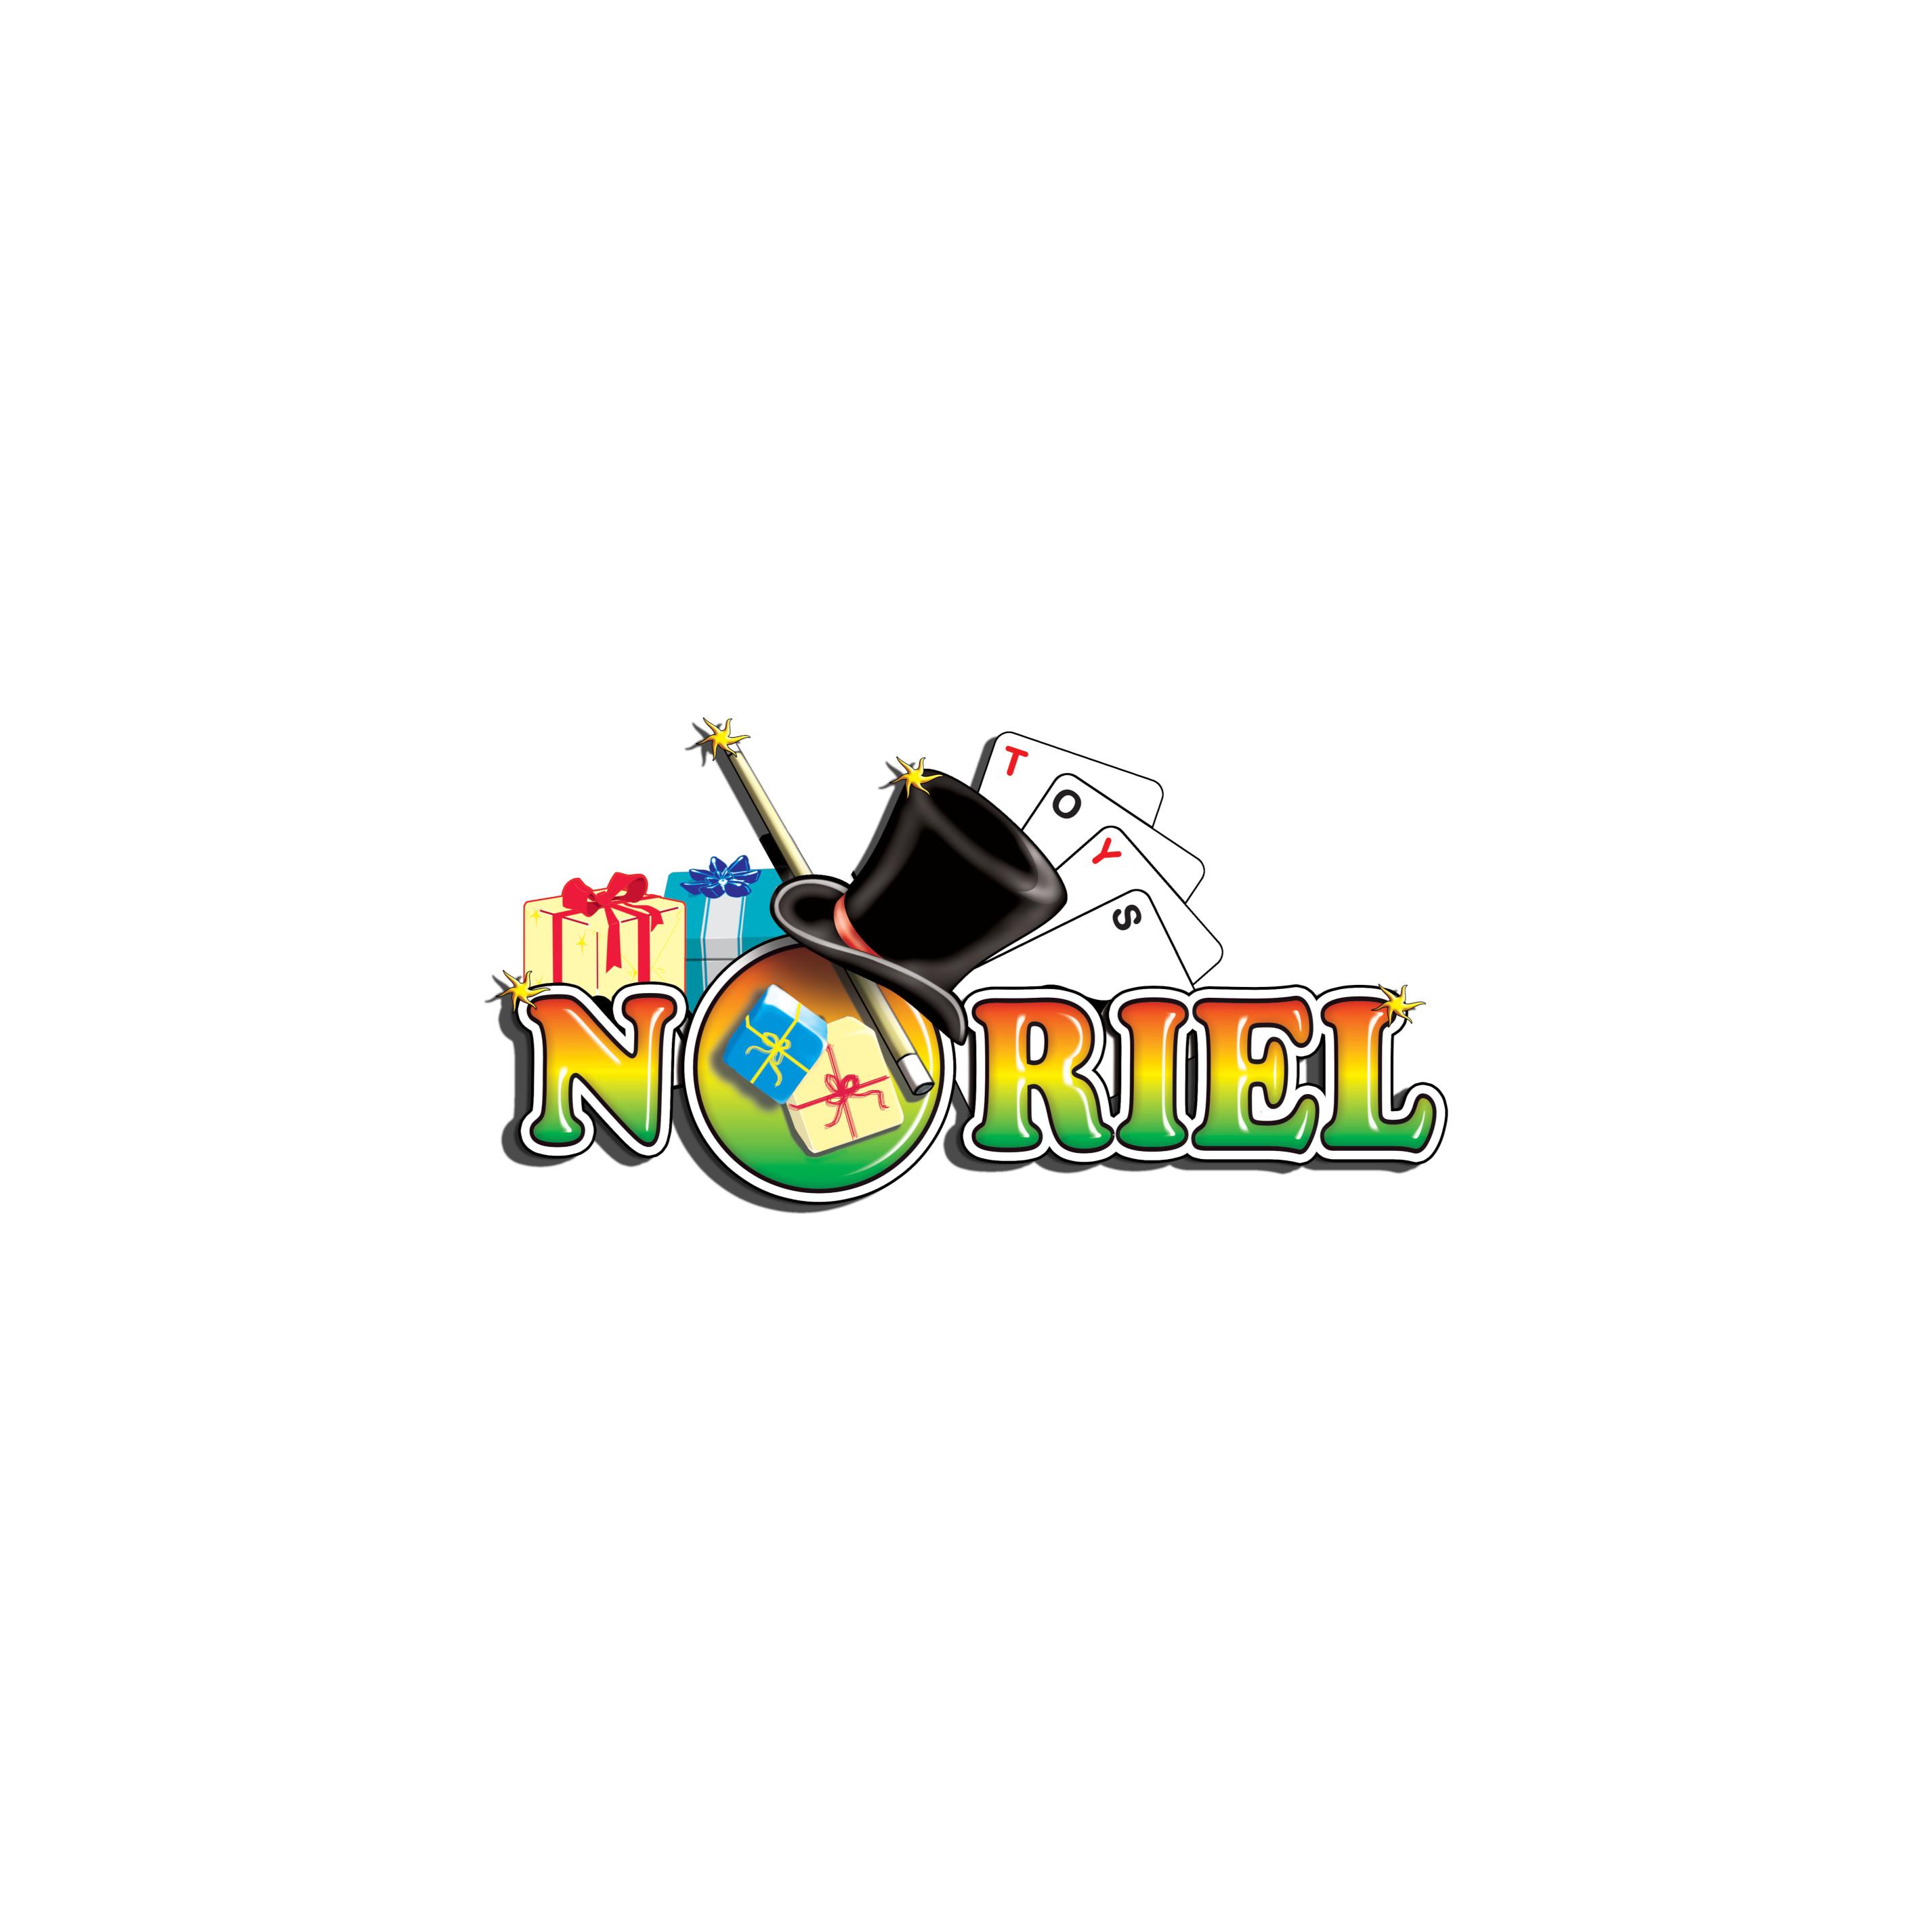 Minimonkey - Sling bumbac 4 in 1, Gri